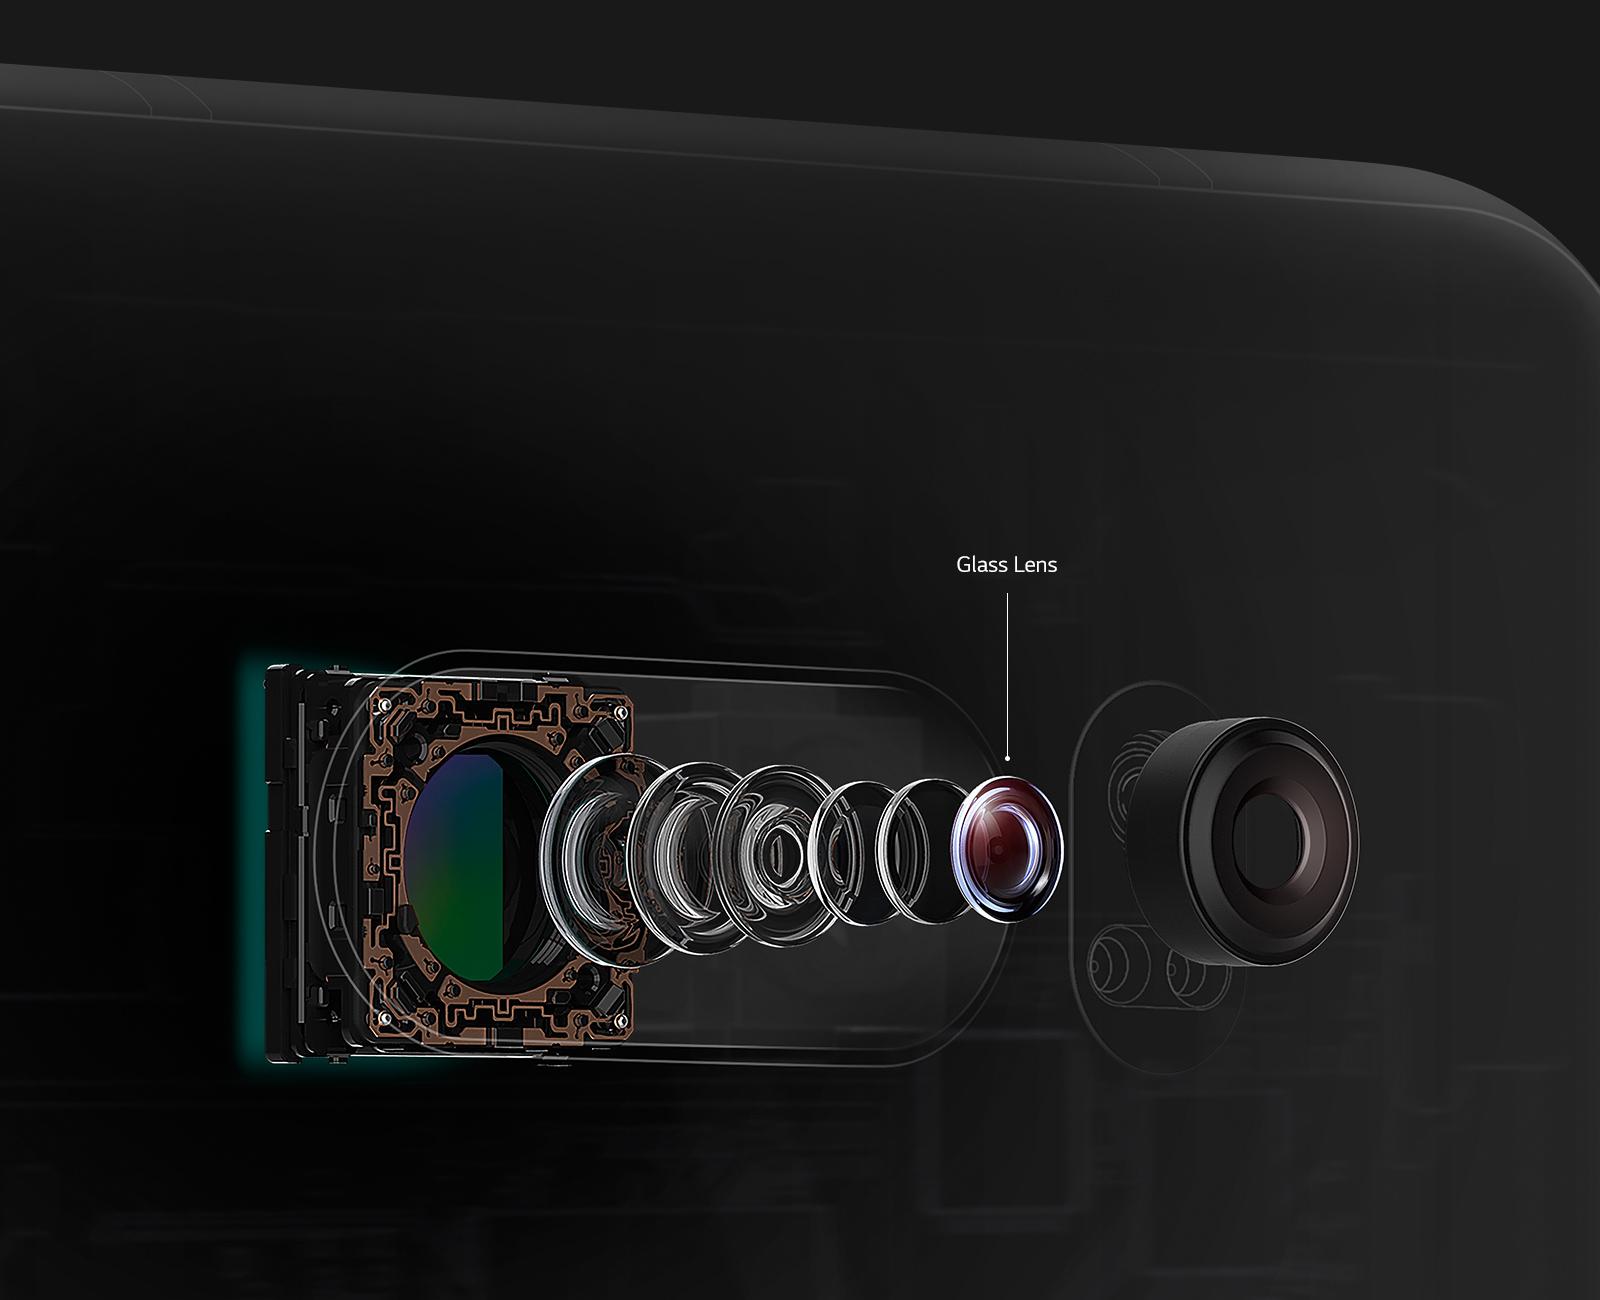 LG V30 plus camera